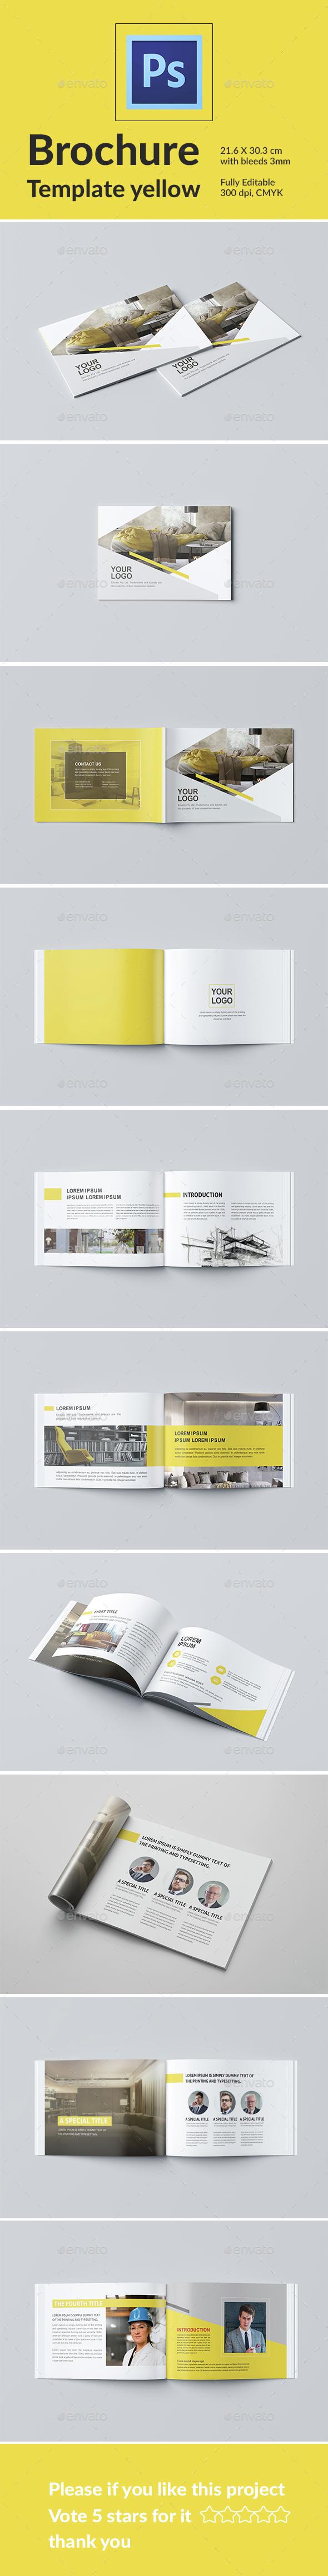 Brochure Template Yellow - Catalogs Brochures